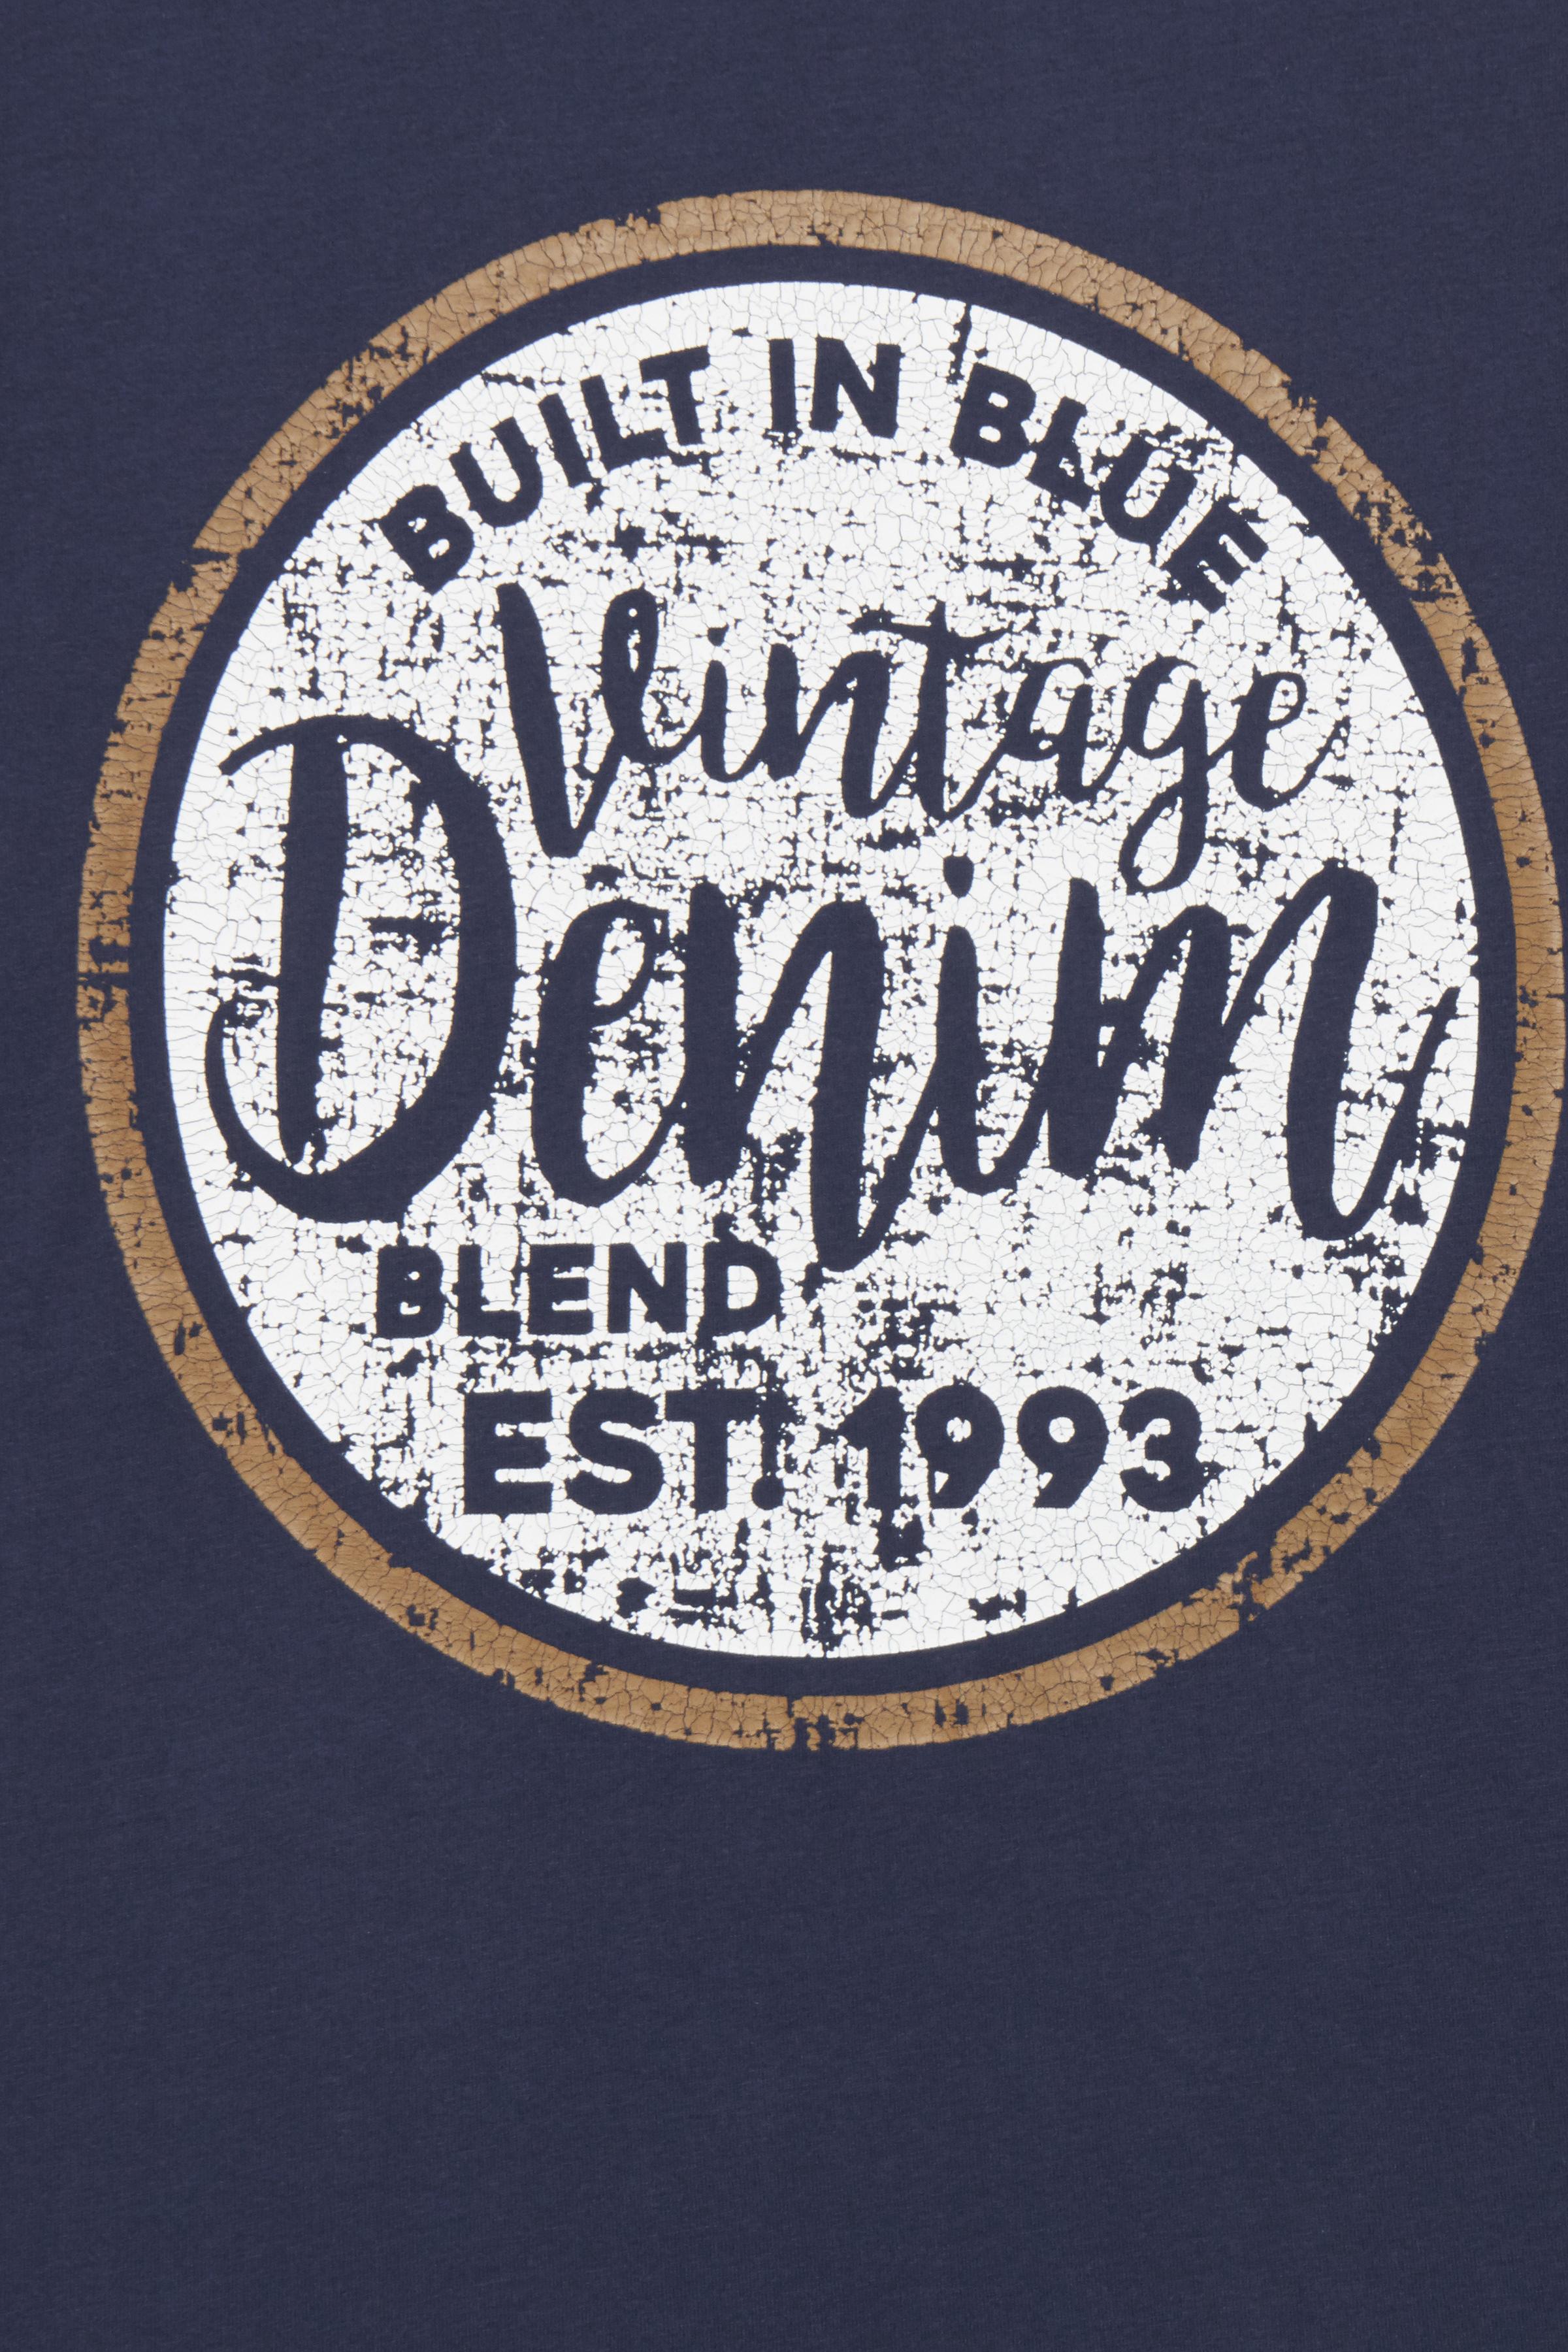 Marineblå Kortærmet T-shirt fra Blend He – Køb Marineblå Kortærmet T-shirt fra str. S-3XL her